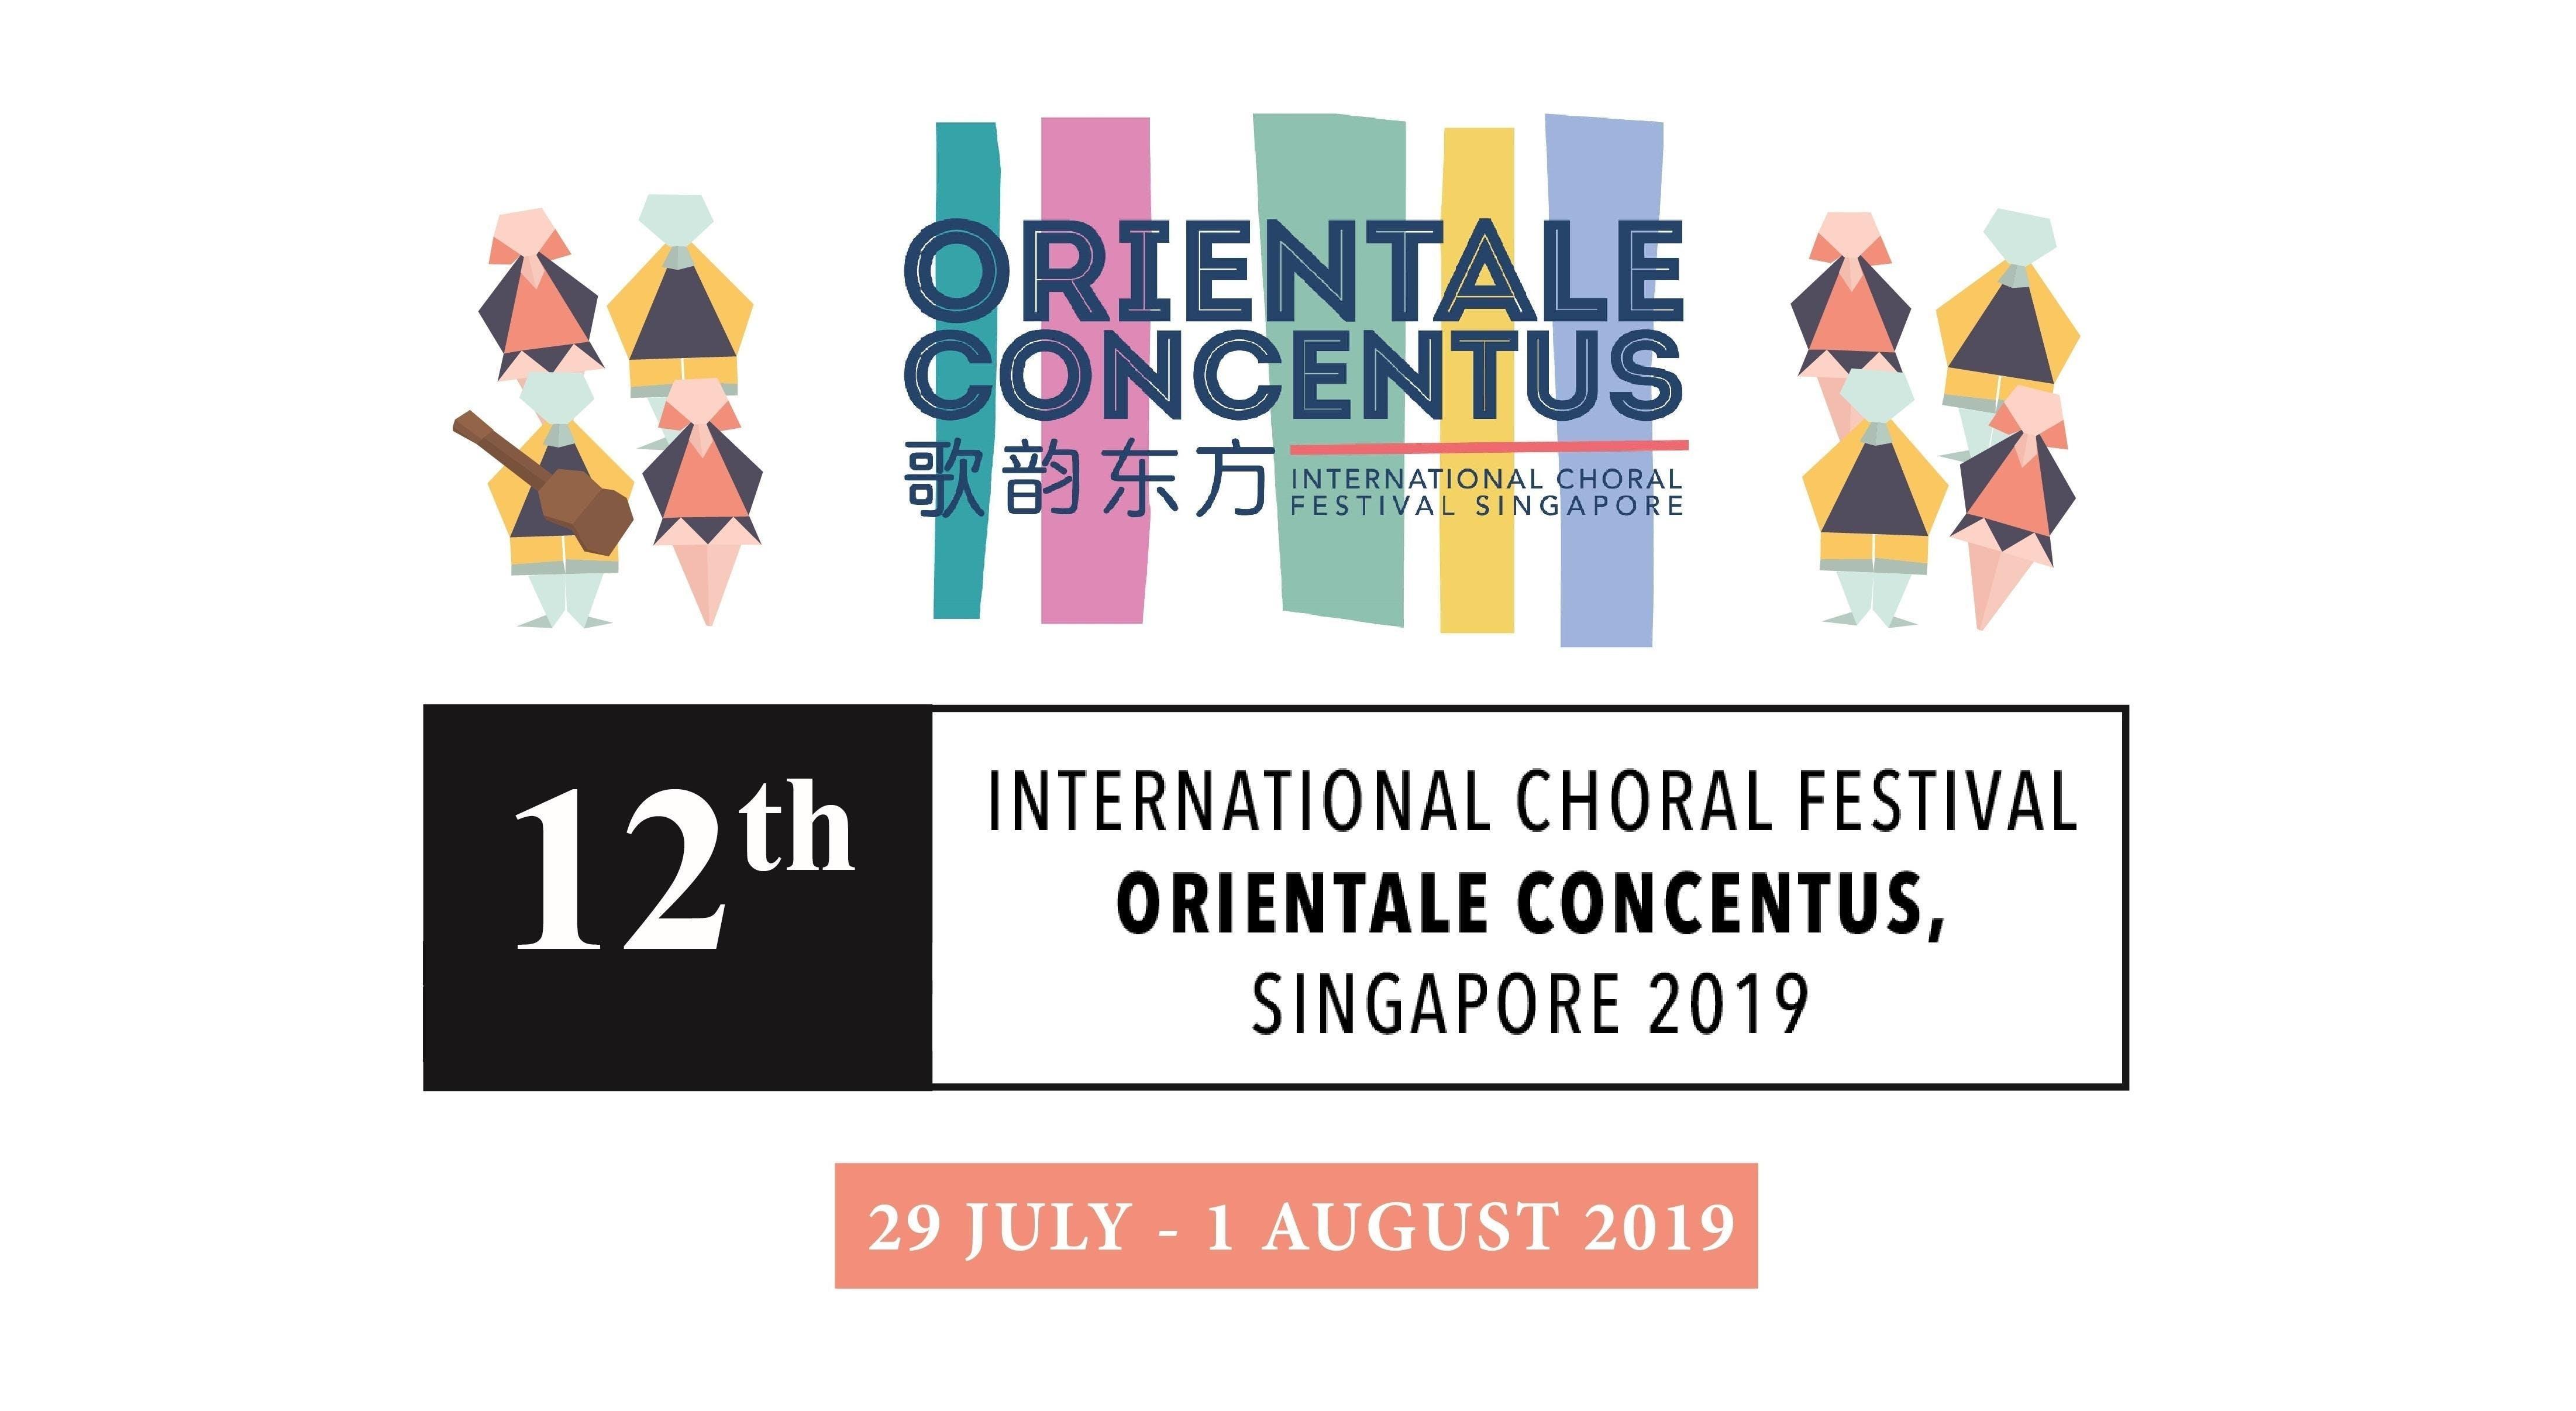 12th International Choral Festival Orientale